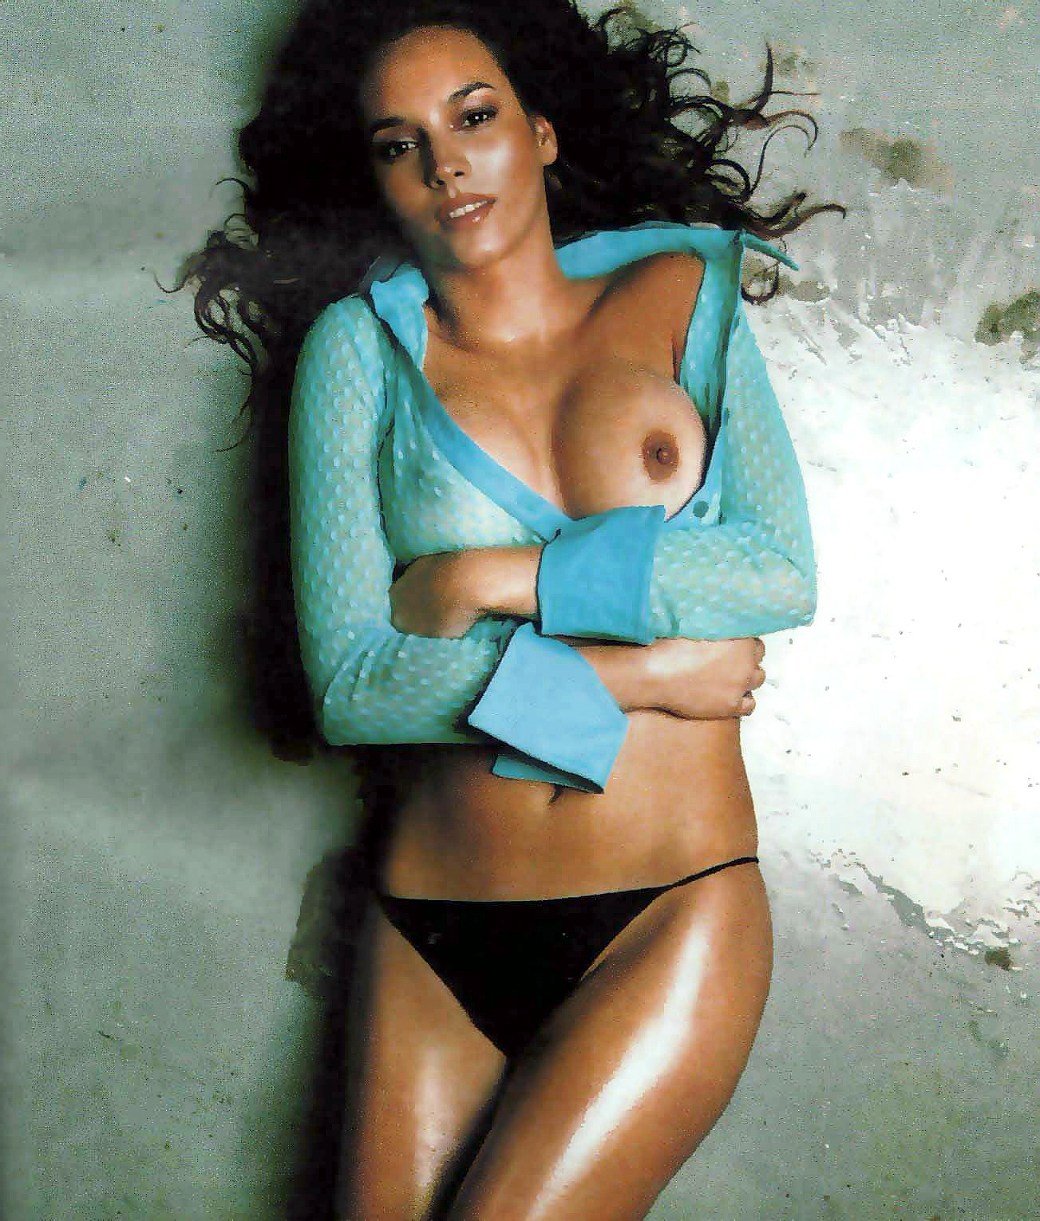 Christina ricci nude boobs from prozac nation movie - 3 part 4